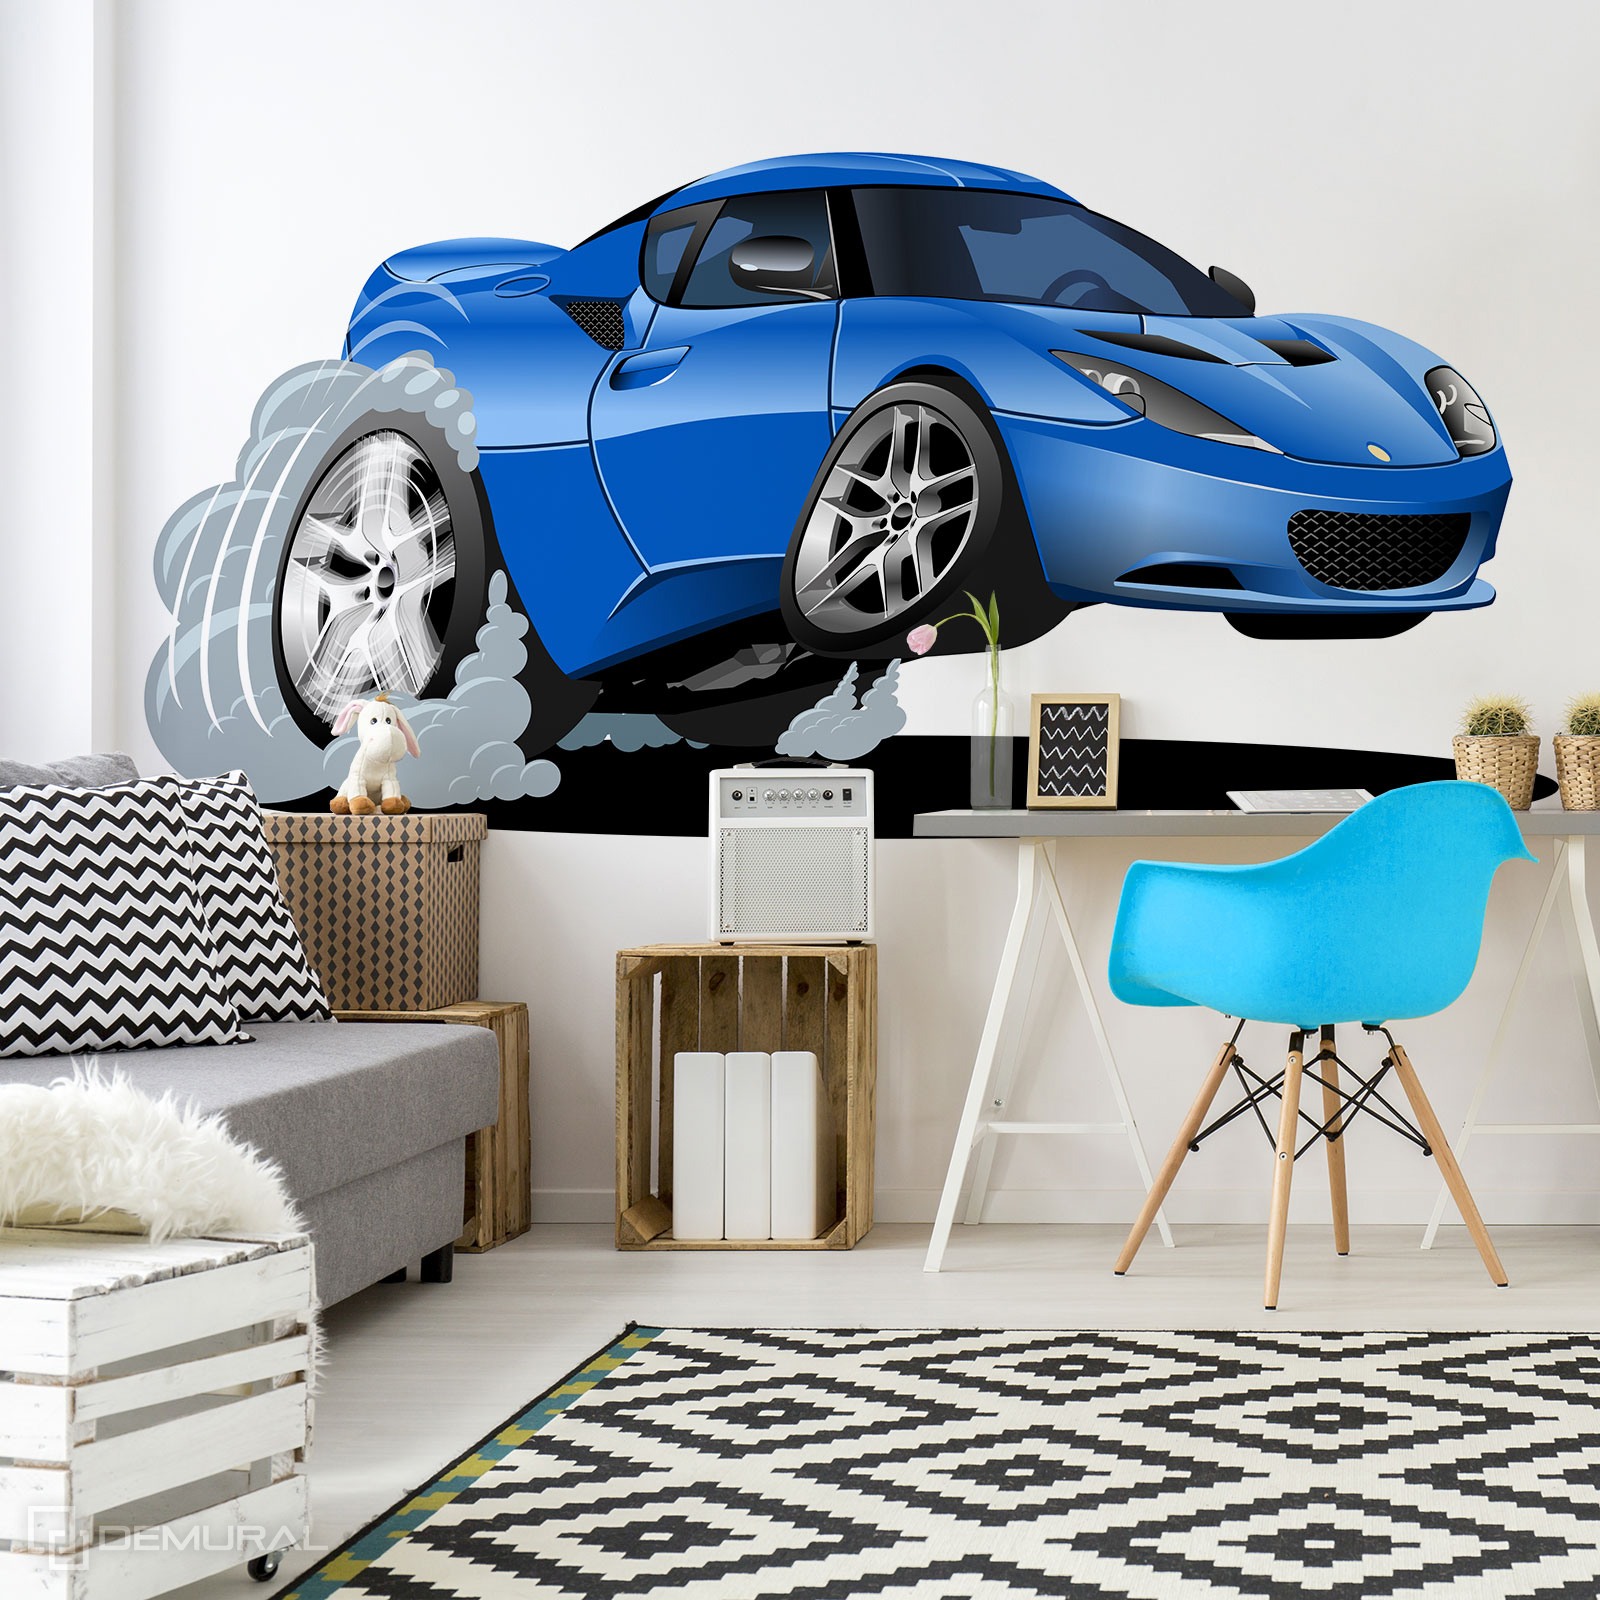 Fototapete Speeding Spielzeugauto - Fototapete mit Auto - Demural